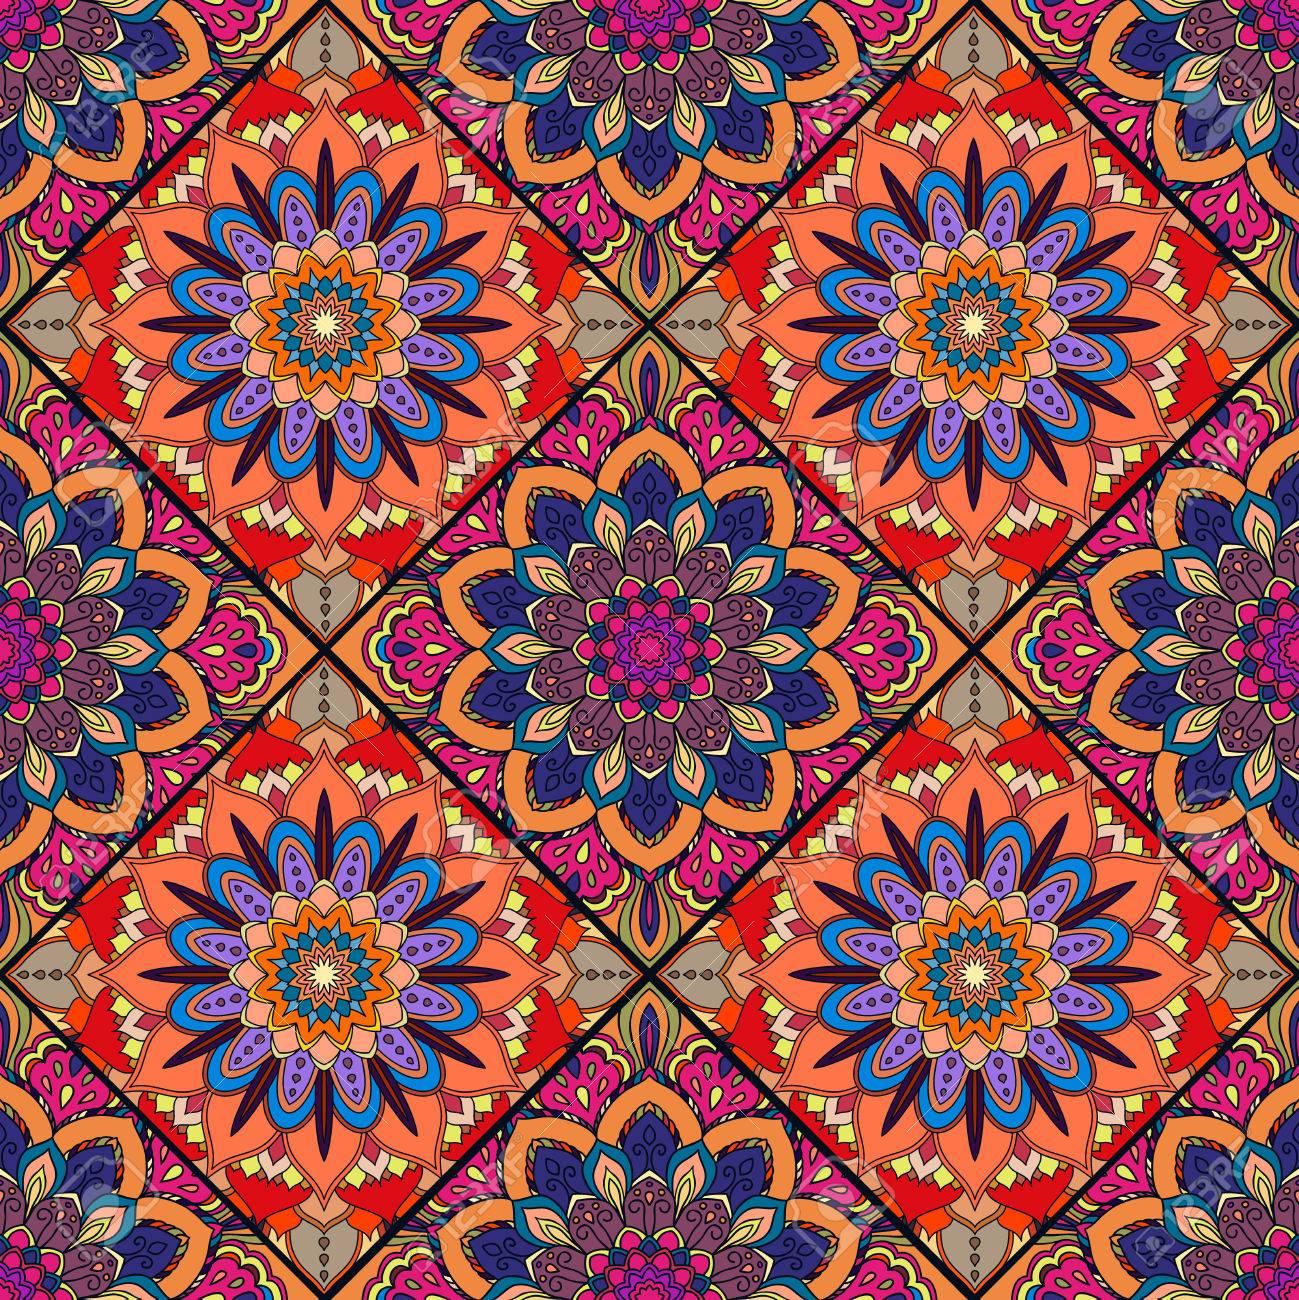 Ongebruikt Rood Blauw Boho Bloem Naadloos Patroon. Mandala Patchwork, Bloemen HP-66